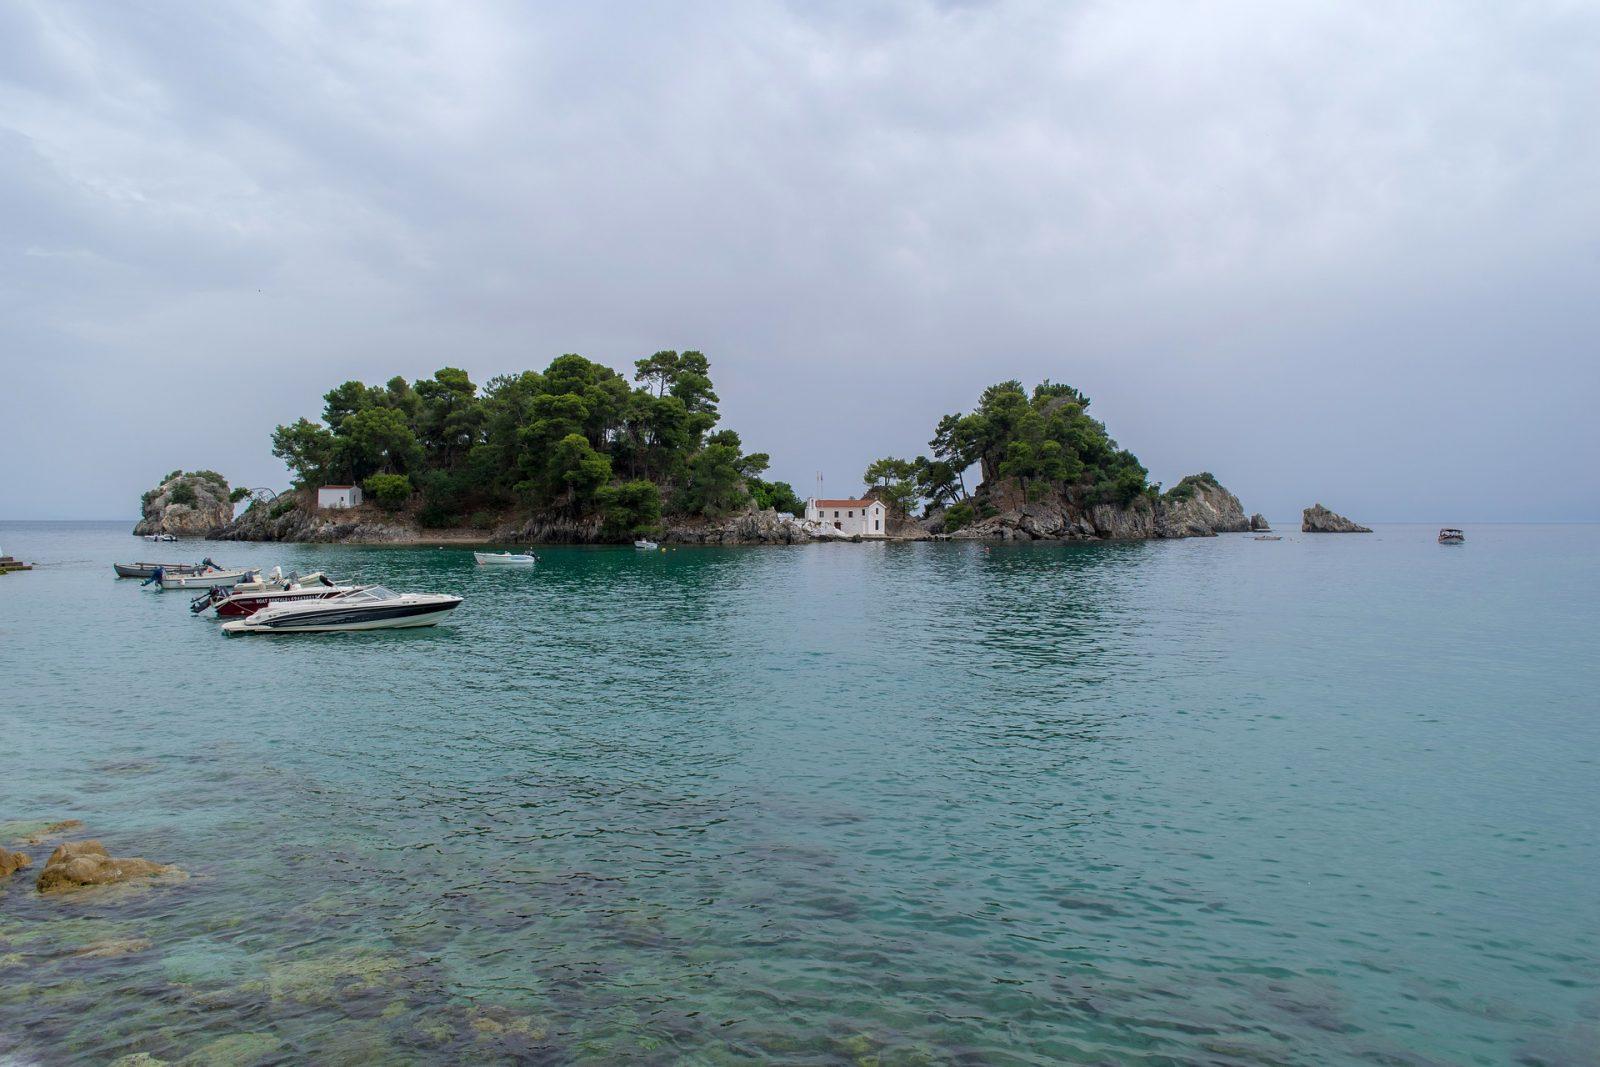 Letovanje u Pargi, Letovanje Grčka apartmani, Parga, gradska plaža